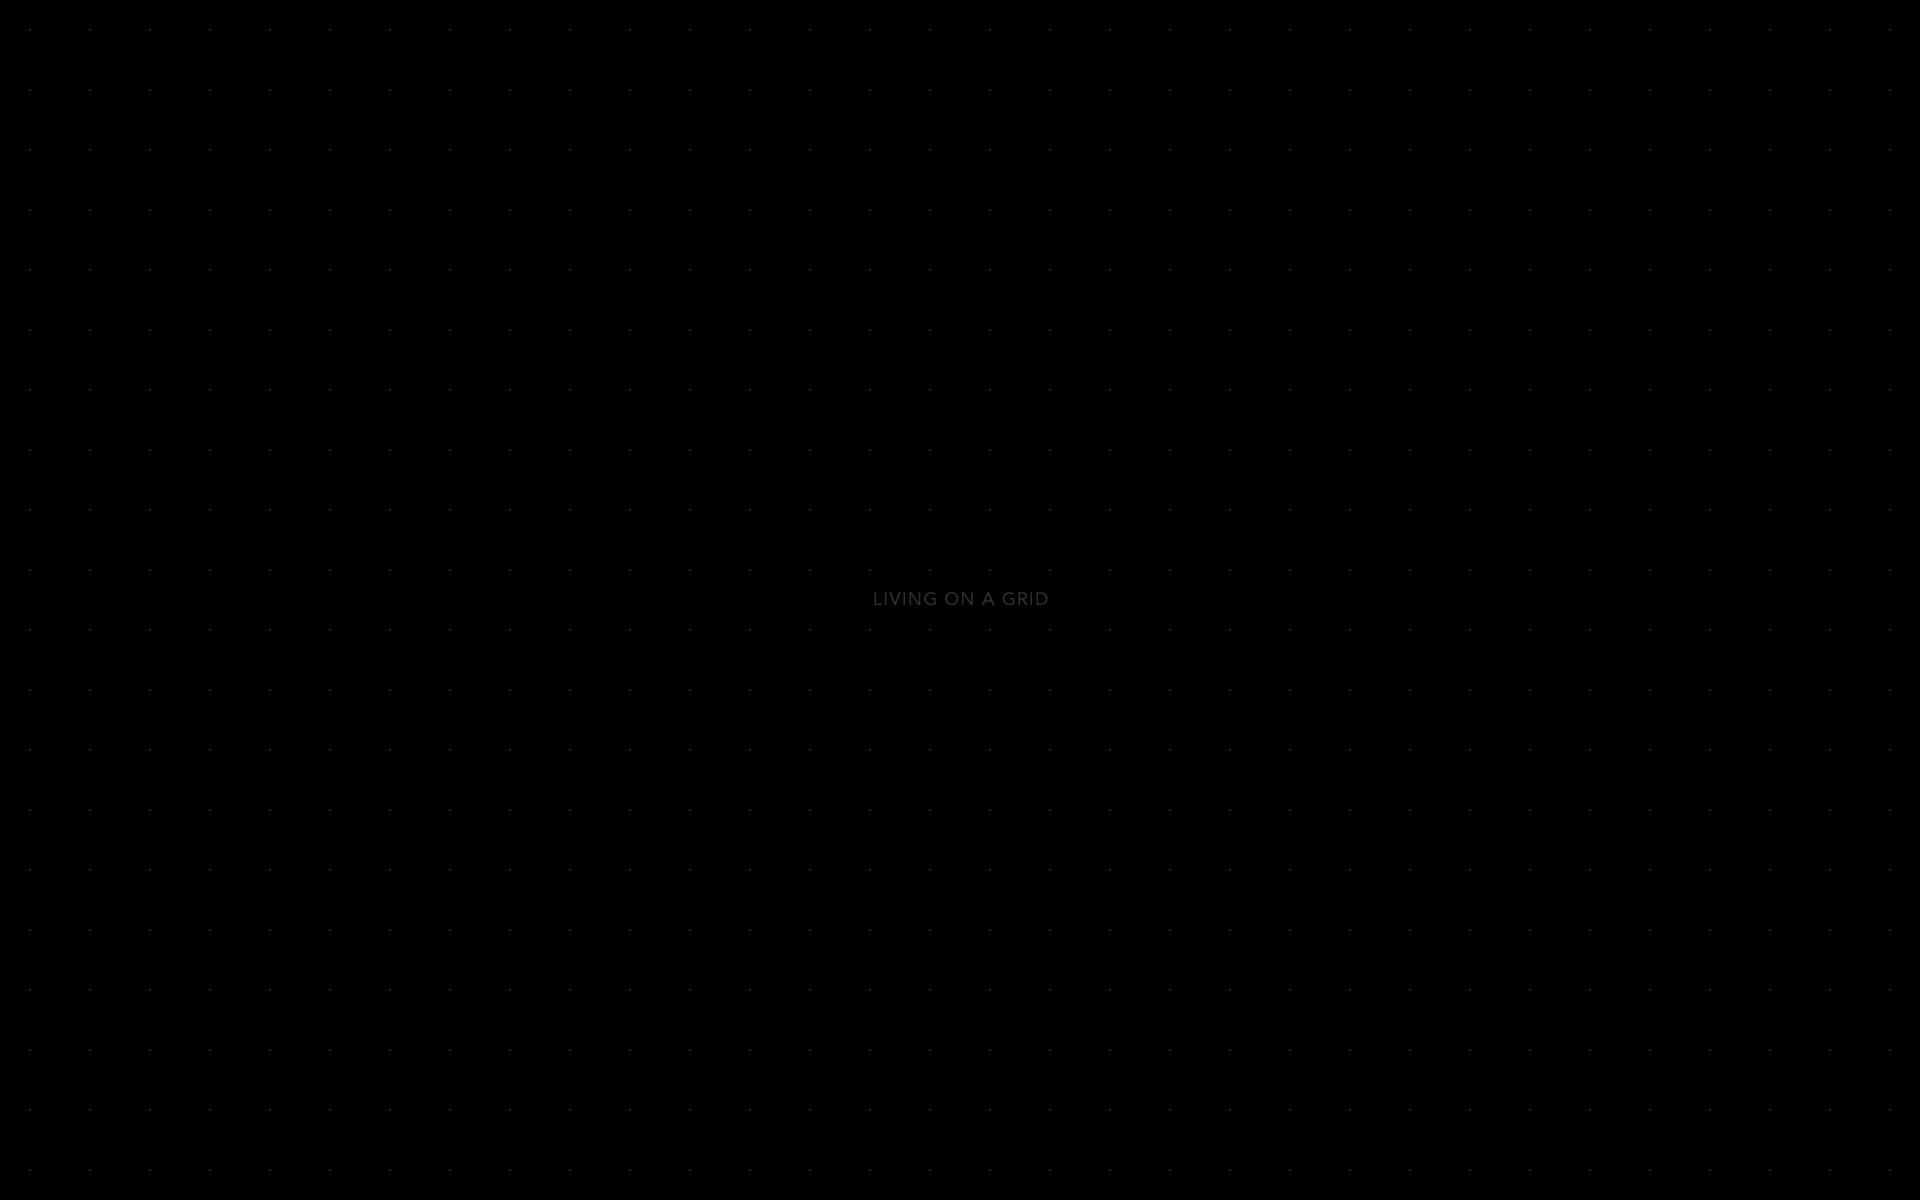 1920x1080 Dark wallpaper